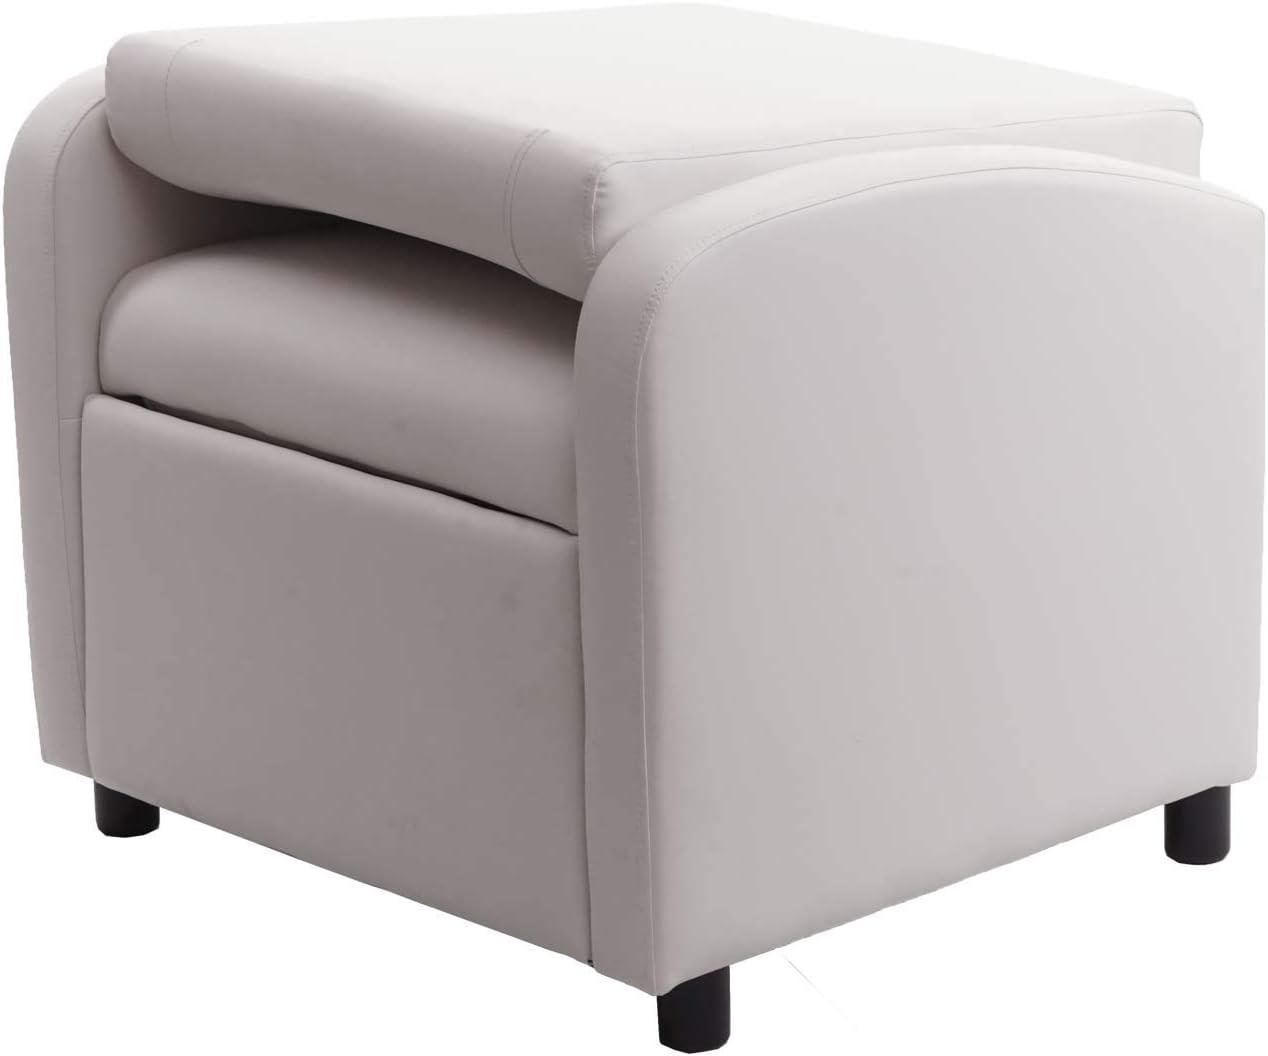 Mendler Poltrona Relax TV HWC-H18 Regolabile Ecopelle 75x70x99cm Bianco